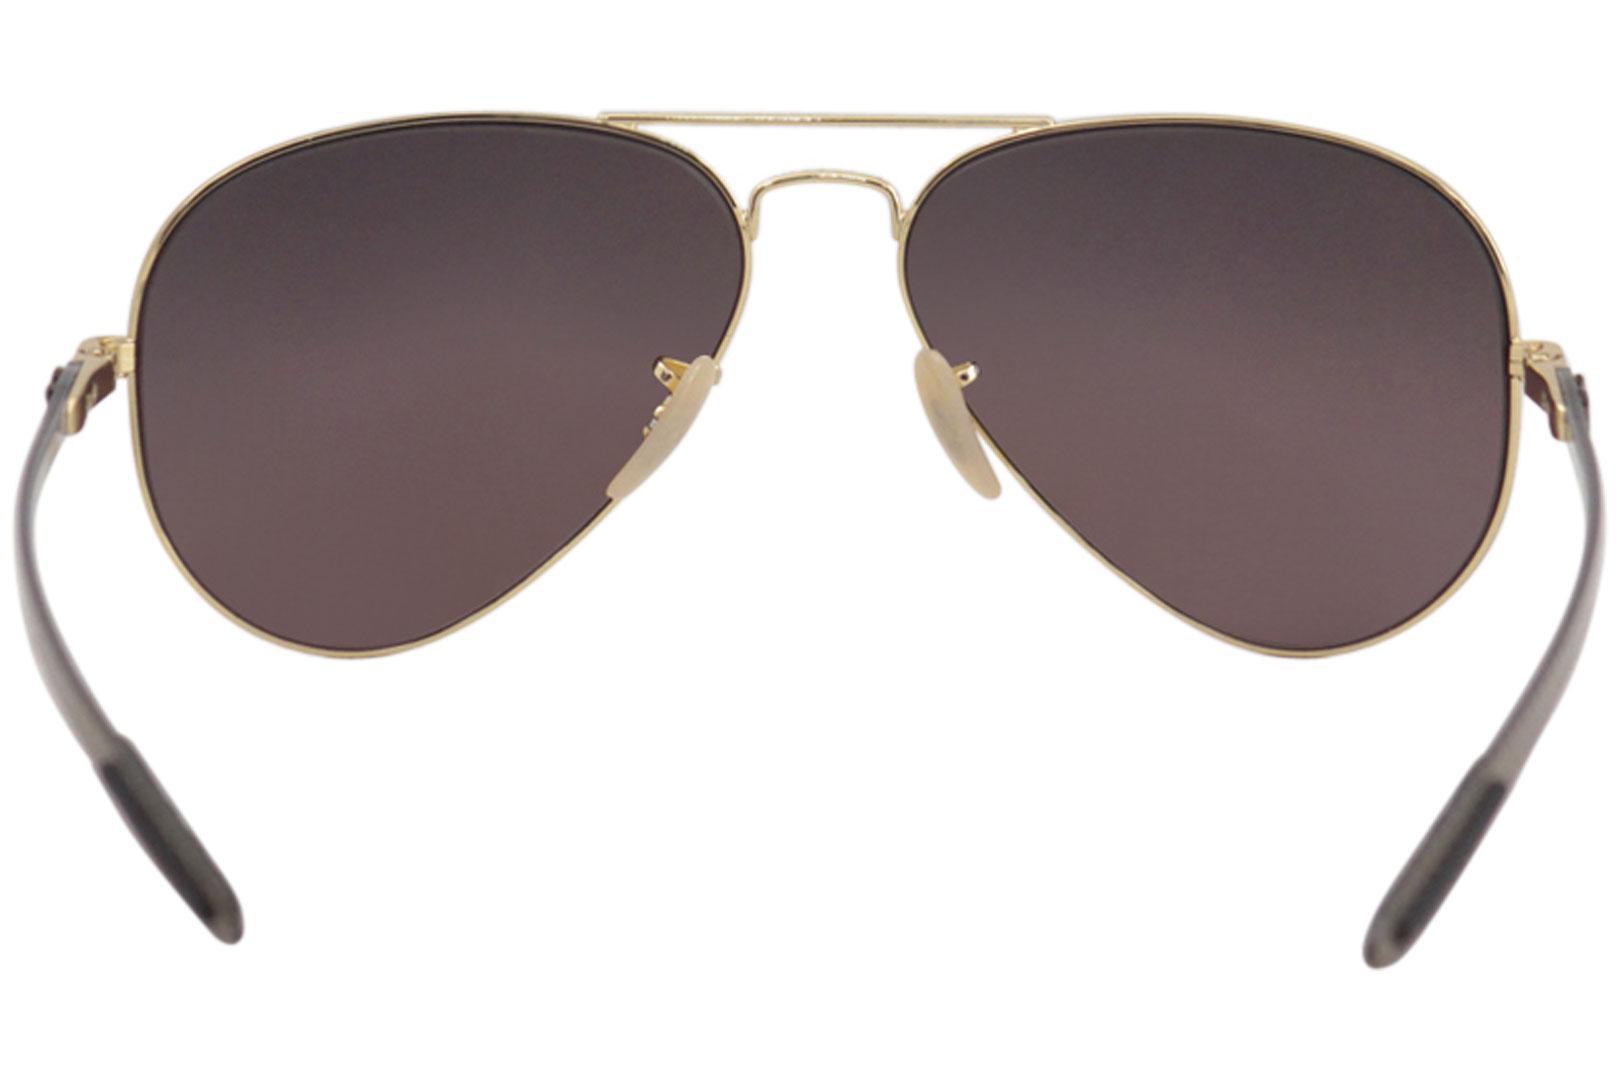 ed62990829 Ray Ban Men s Chromance RB8317CH RB 8317 CH Pilot RayBan Polarized  Sunglasses by Ray Ban. 12345